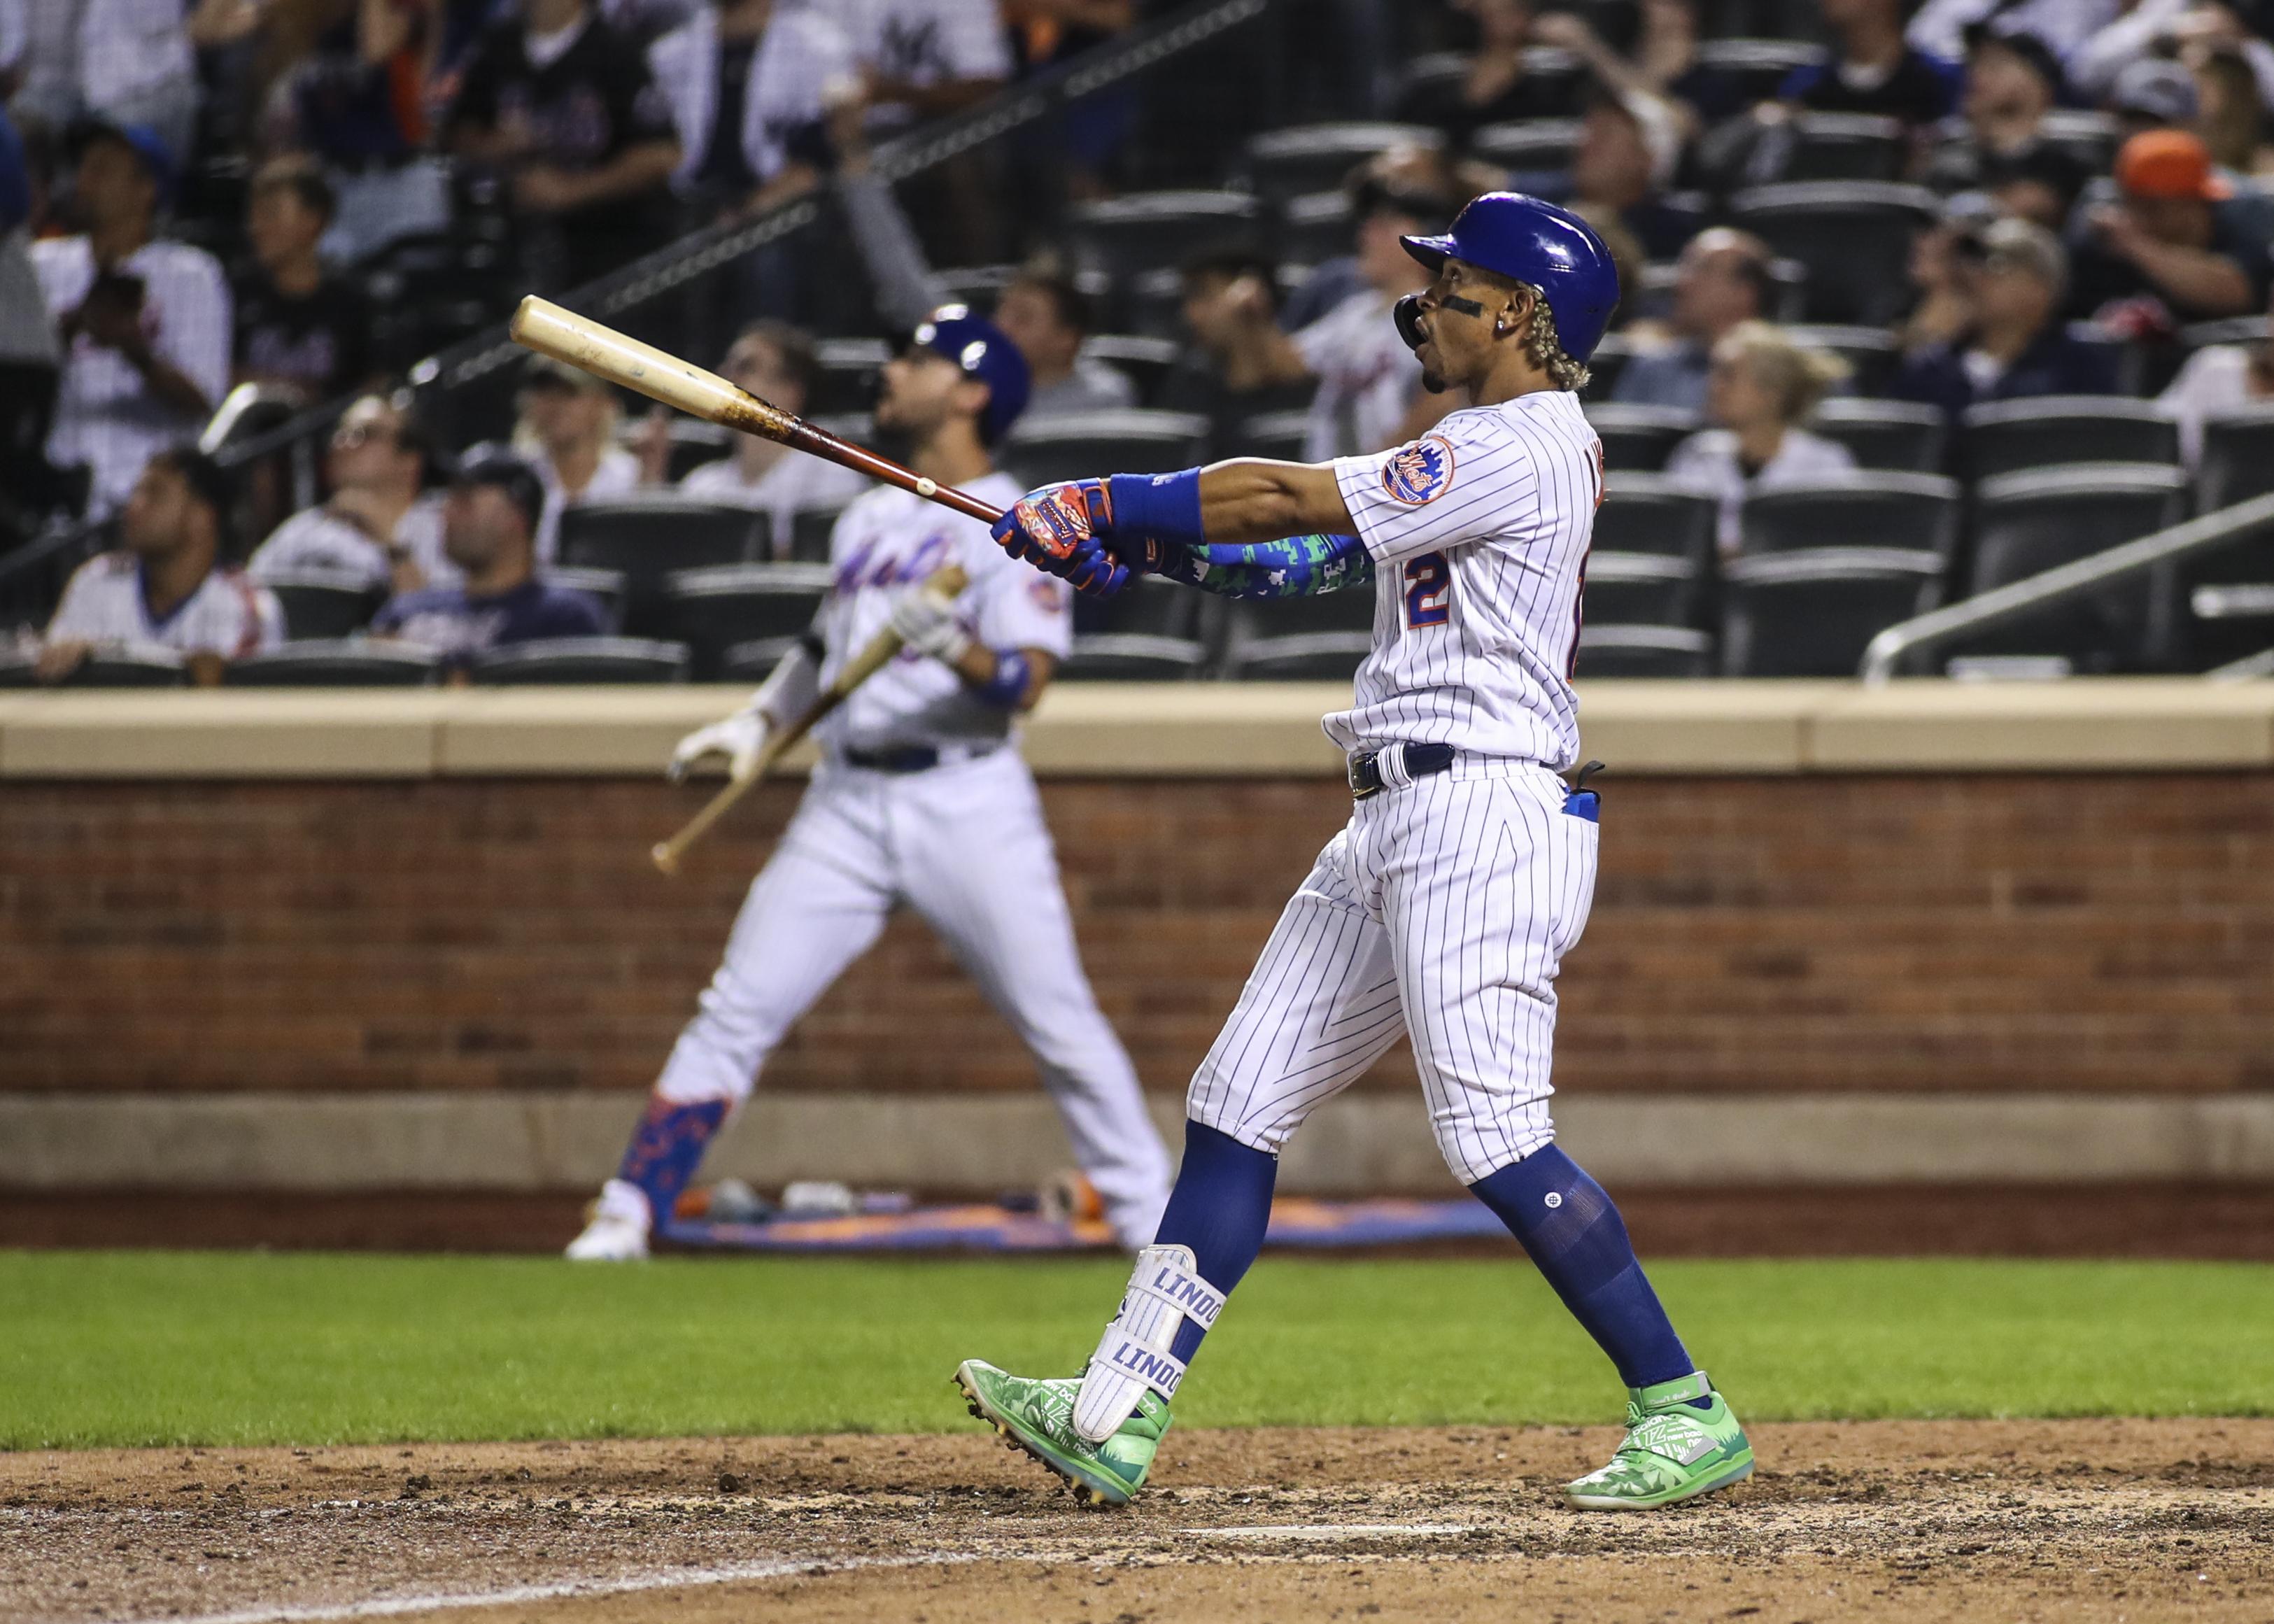 MLB: New York Yankees at New York Mets